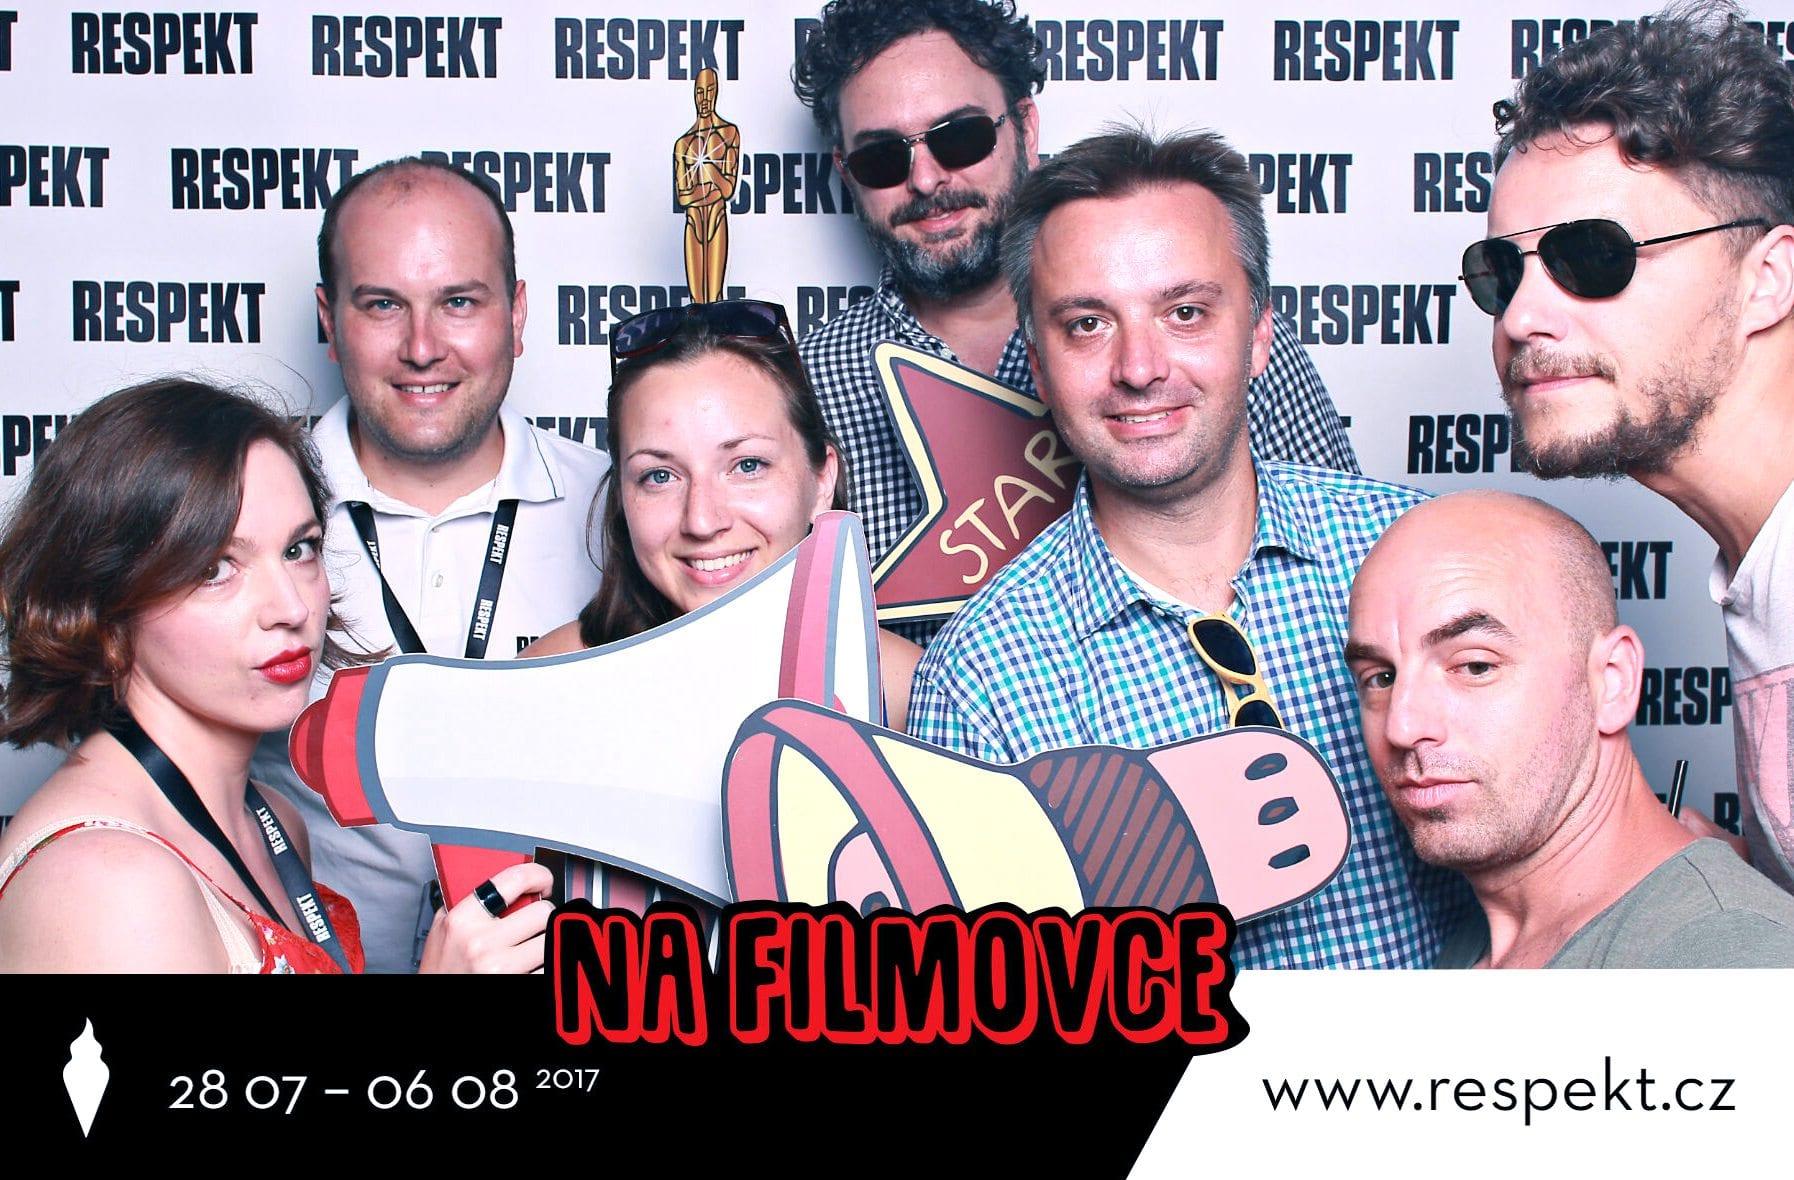 fotokoutek-respekt-na-filmovce-1-8-2017-290926